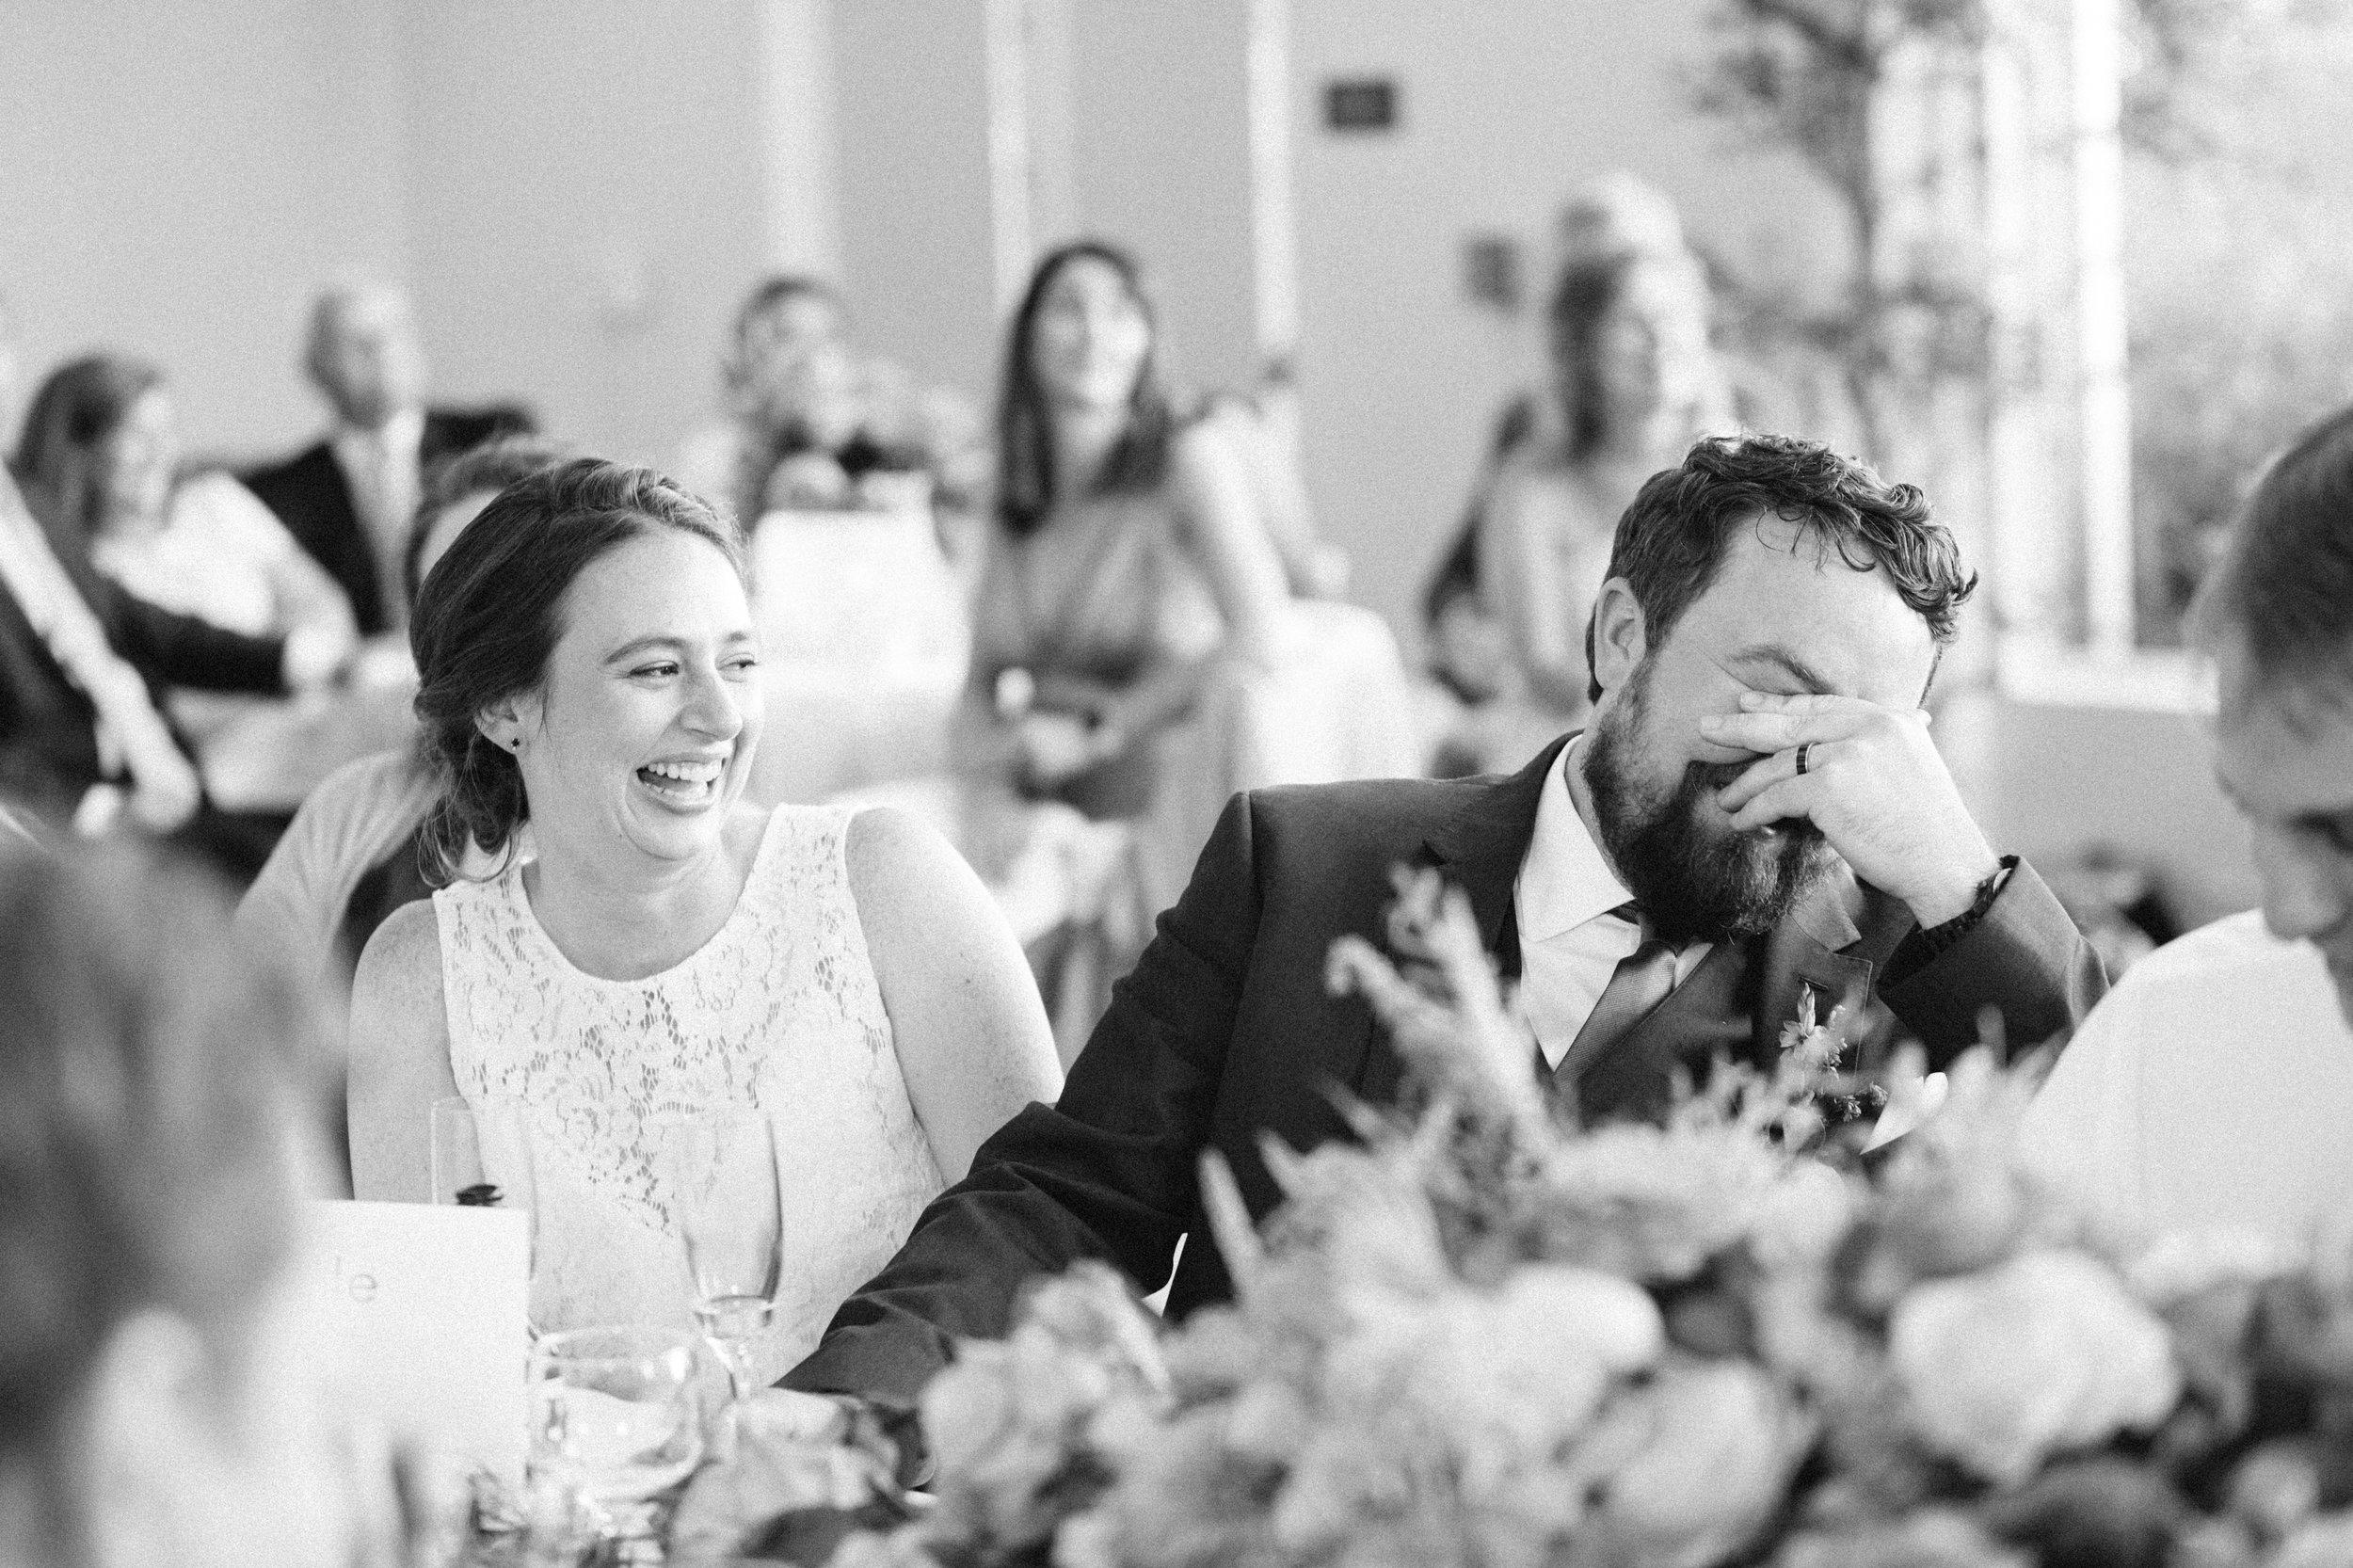 Tucker_Kristina_Wedding_Presidio_San_Francisco_Abigail_Malone_Photography-988.jpg